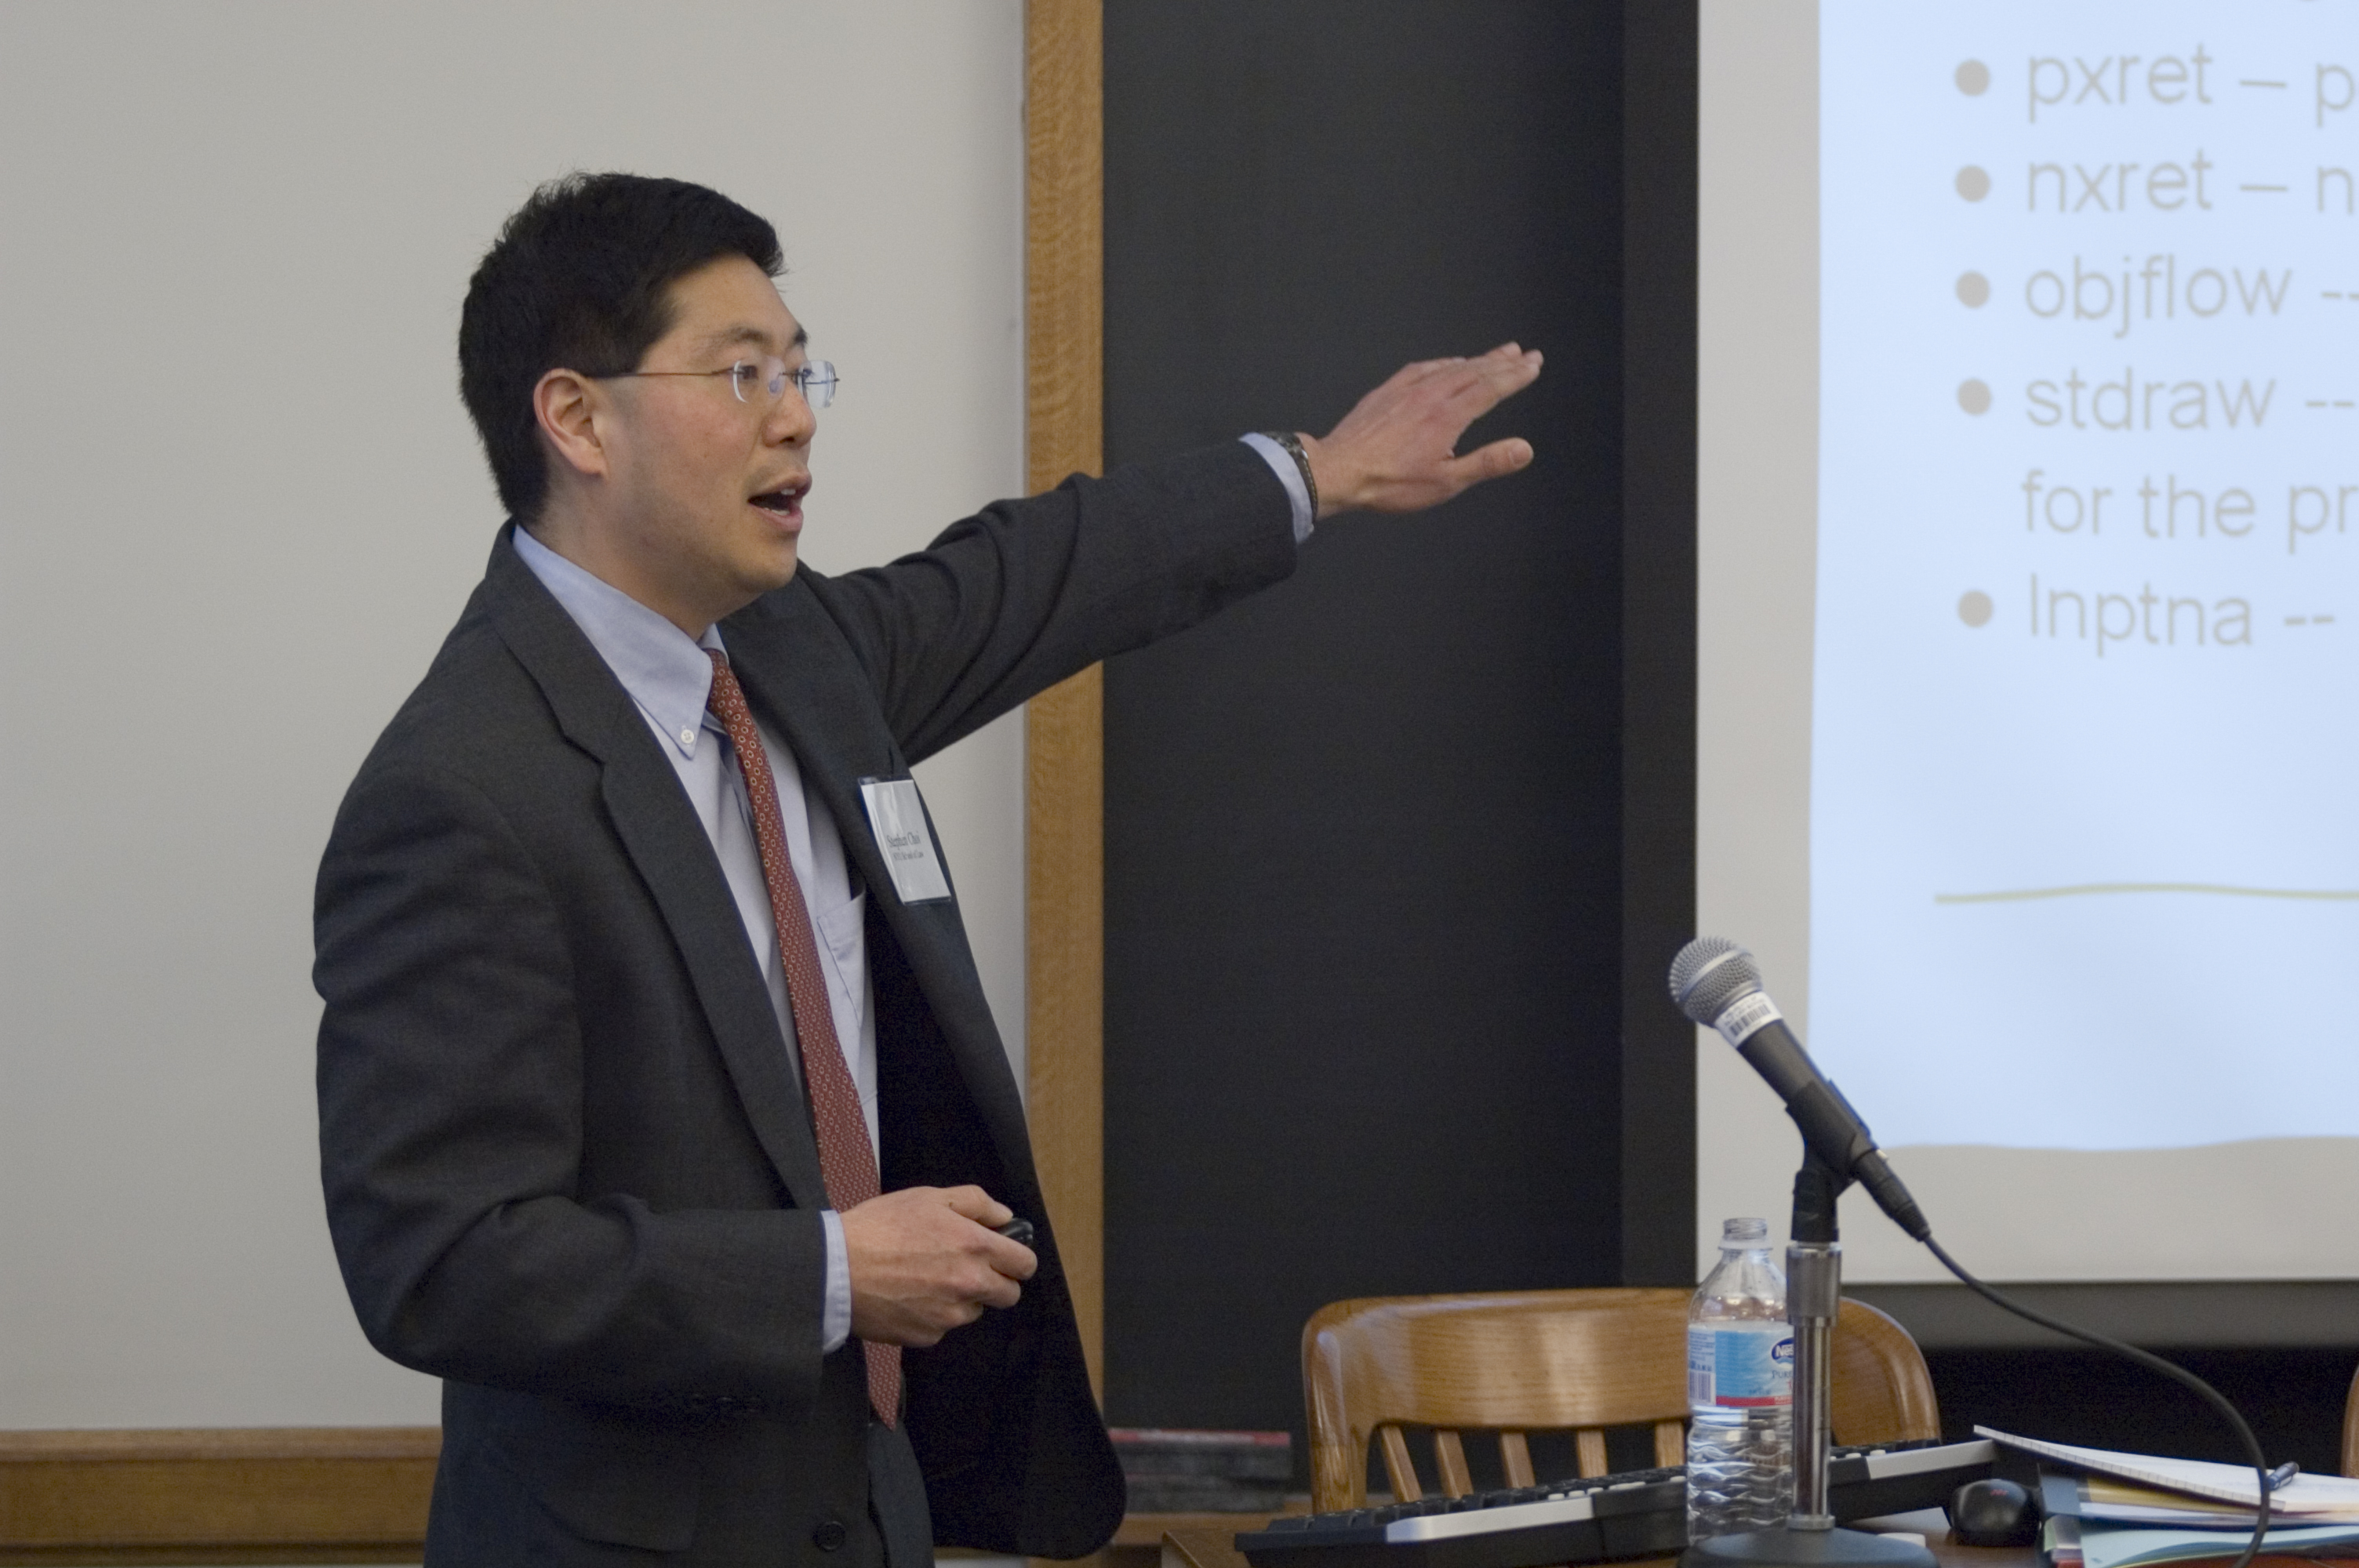 NYU Law Prof. Steven Choi